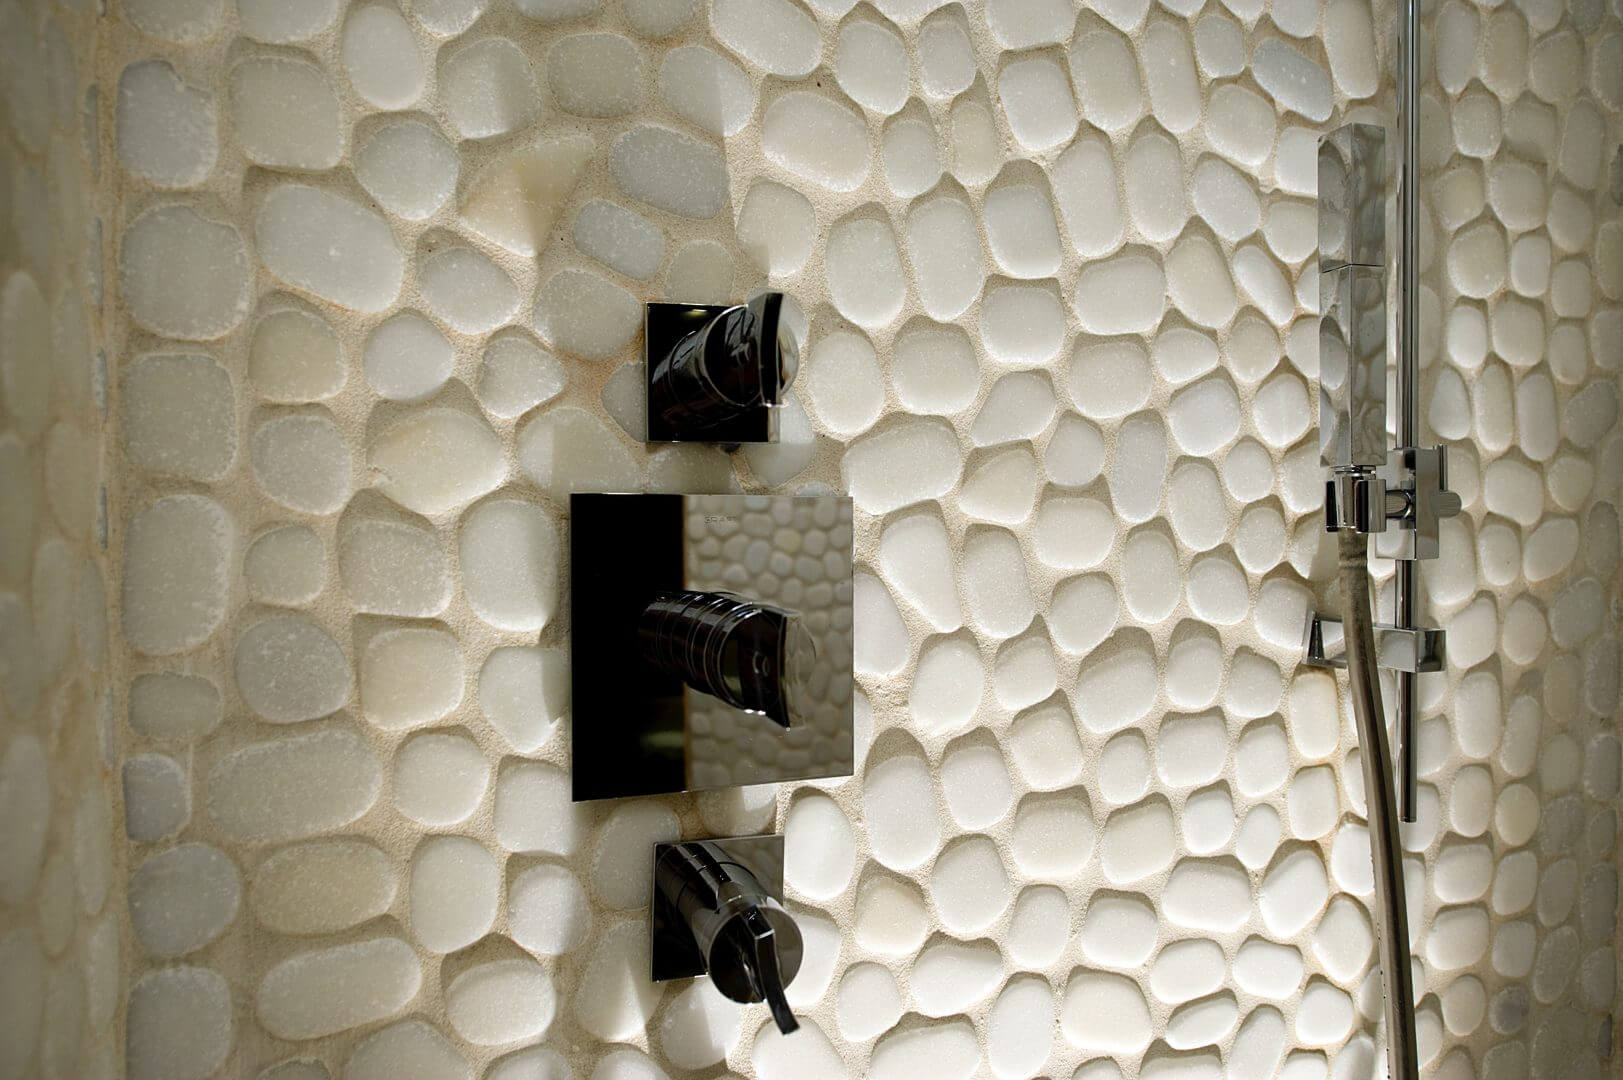 Stein mosaik fliesen - Fliesen mosaik kuche ...